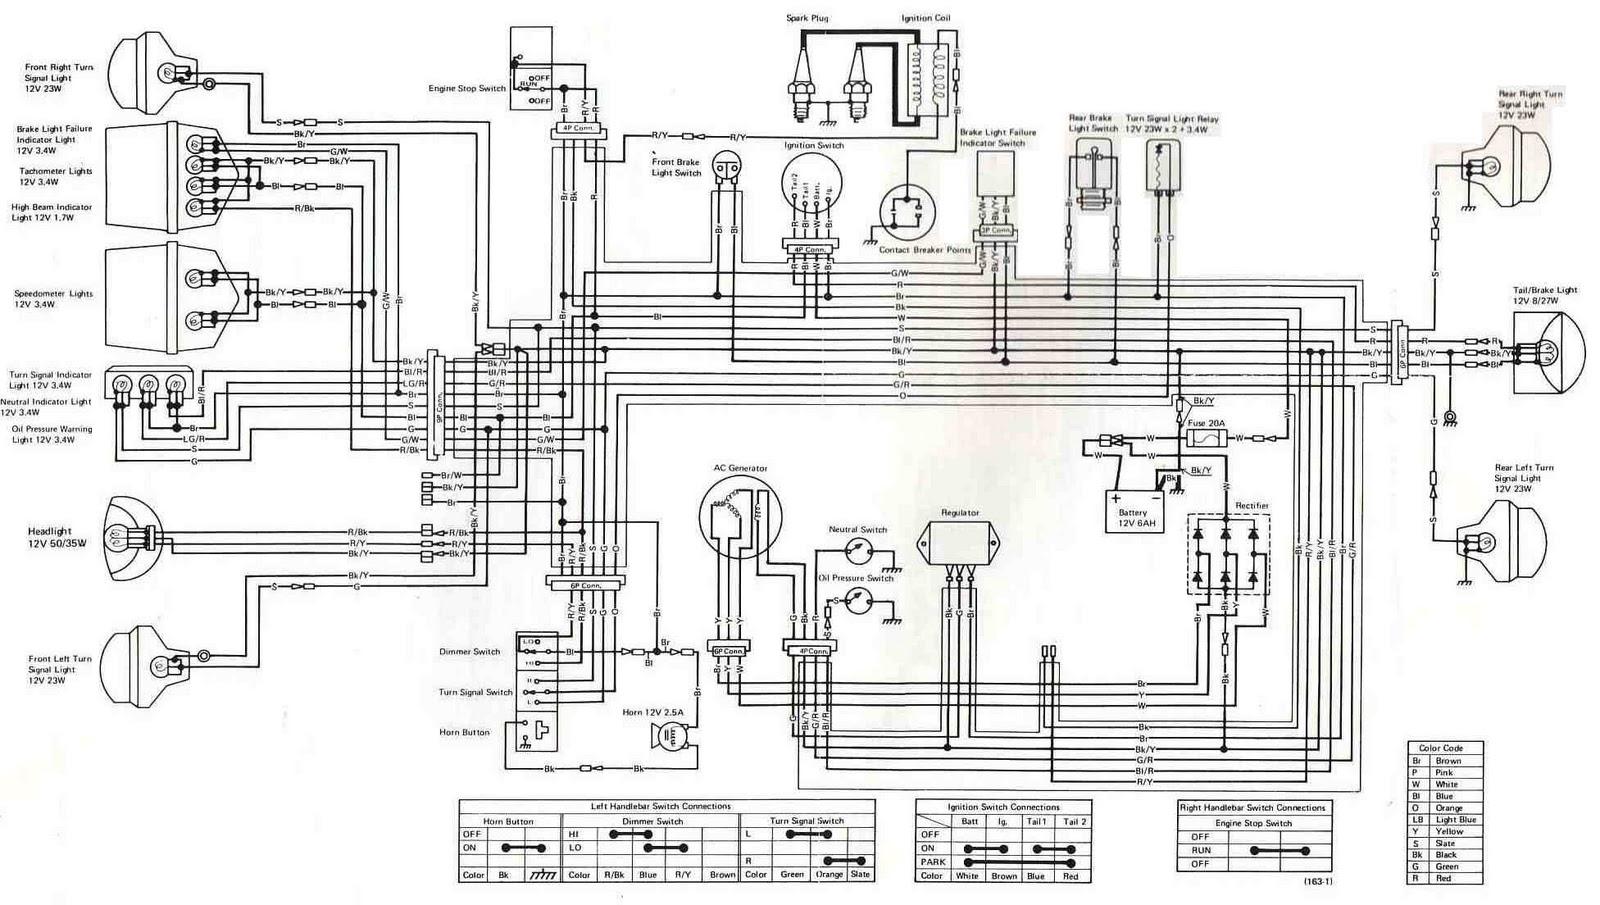 [DIAGRAM_38IU]  B2a Kz650 Wiring Diagram Honda Civic Intake Manifold Wiring -  megawati.5.allianceconseil59.fr | Kz650 Wiring Diagram |  | megawati.5.allianceconseil59.fr